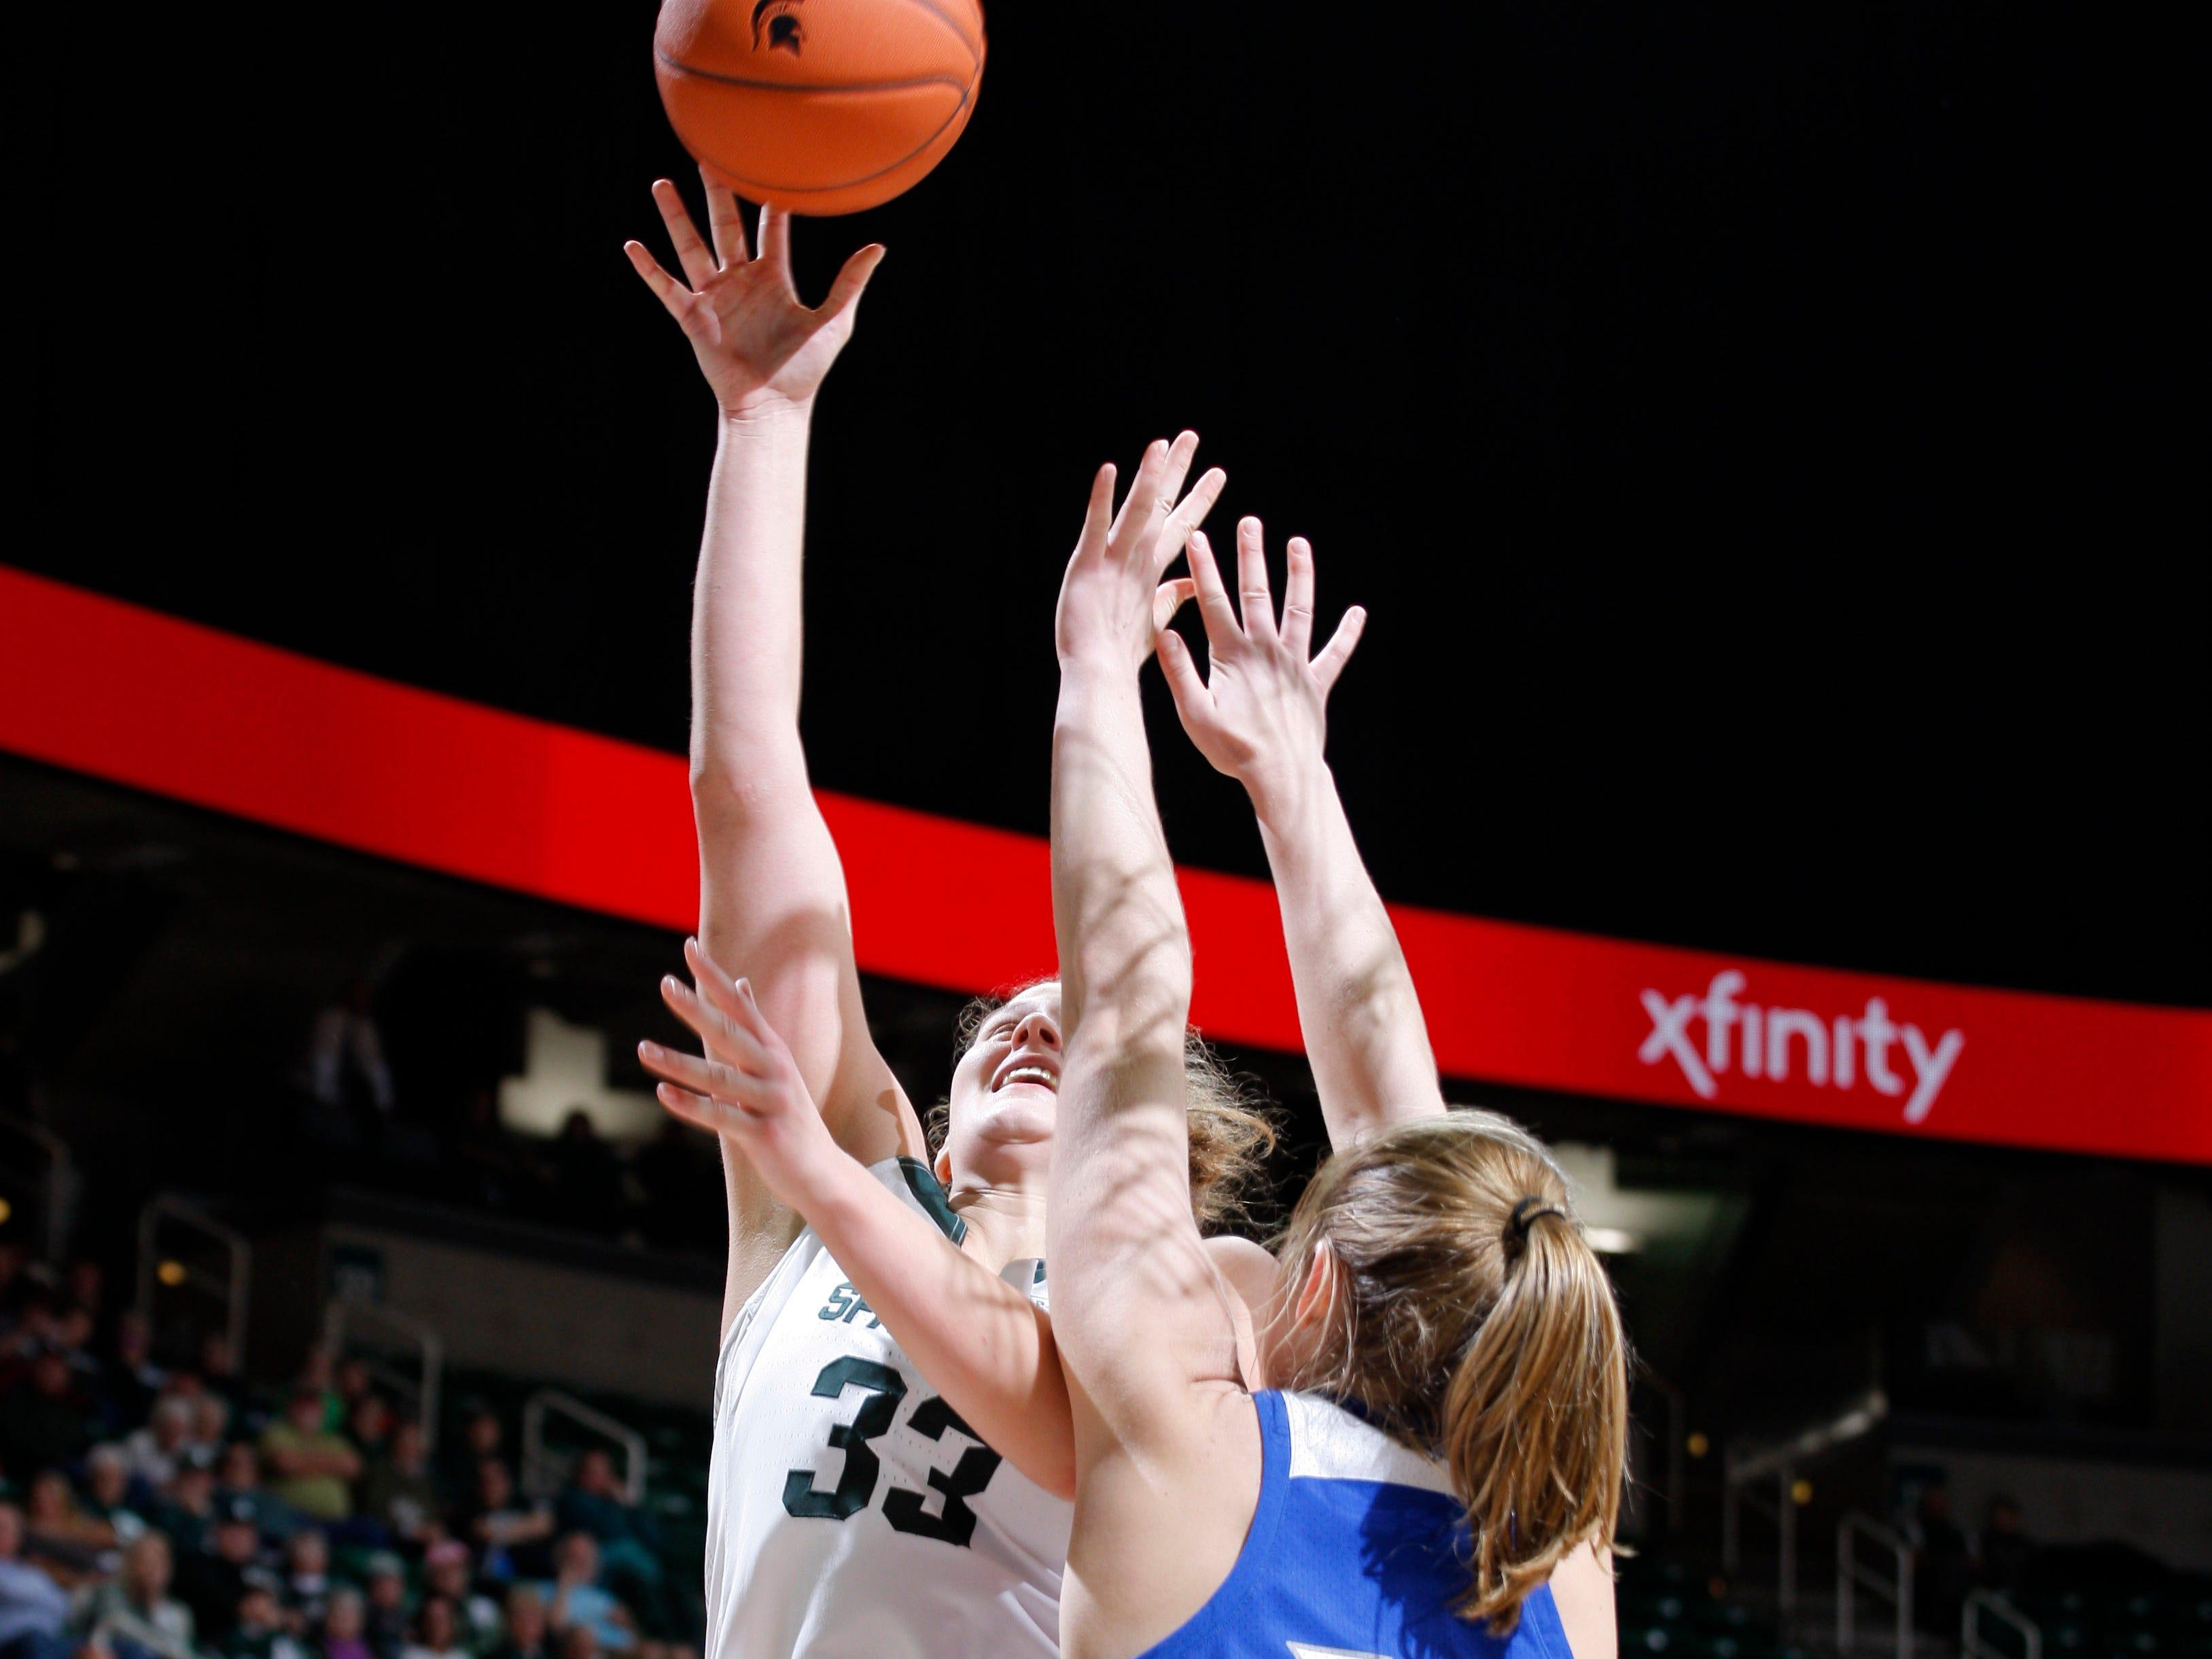 Michigan State's Jenna Allen, left, shoots against Hillsdale's Julia Wacker, Thursday, Nov. 1, 2018, in East Lansing, Mich.